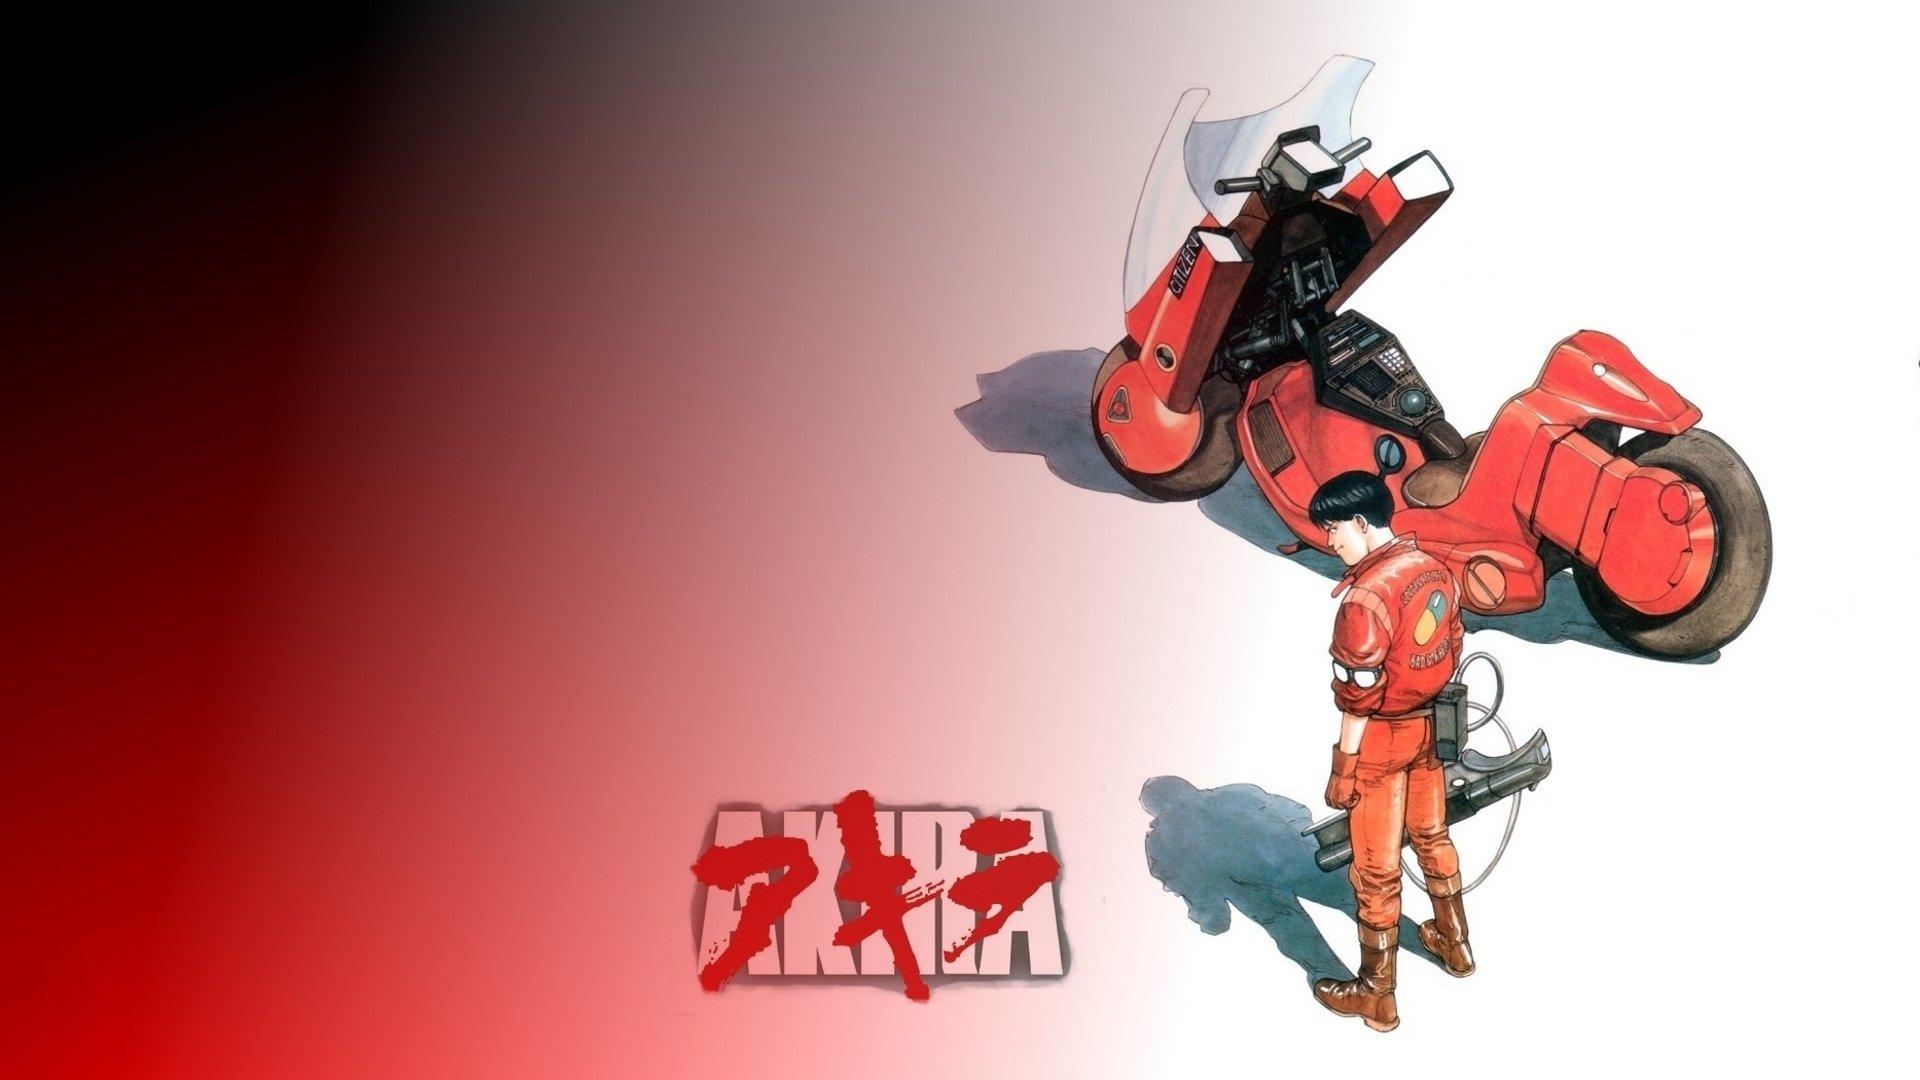 Anime - Akira  Fond d'écran